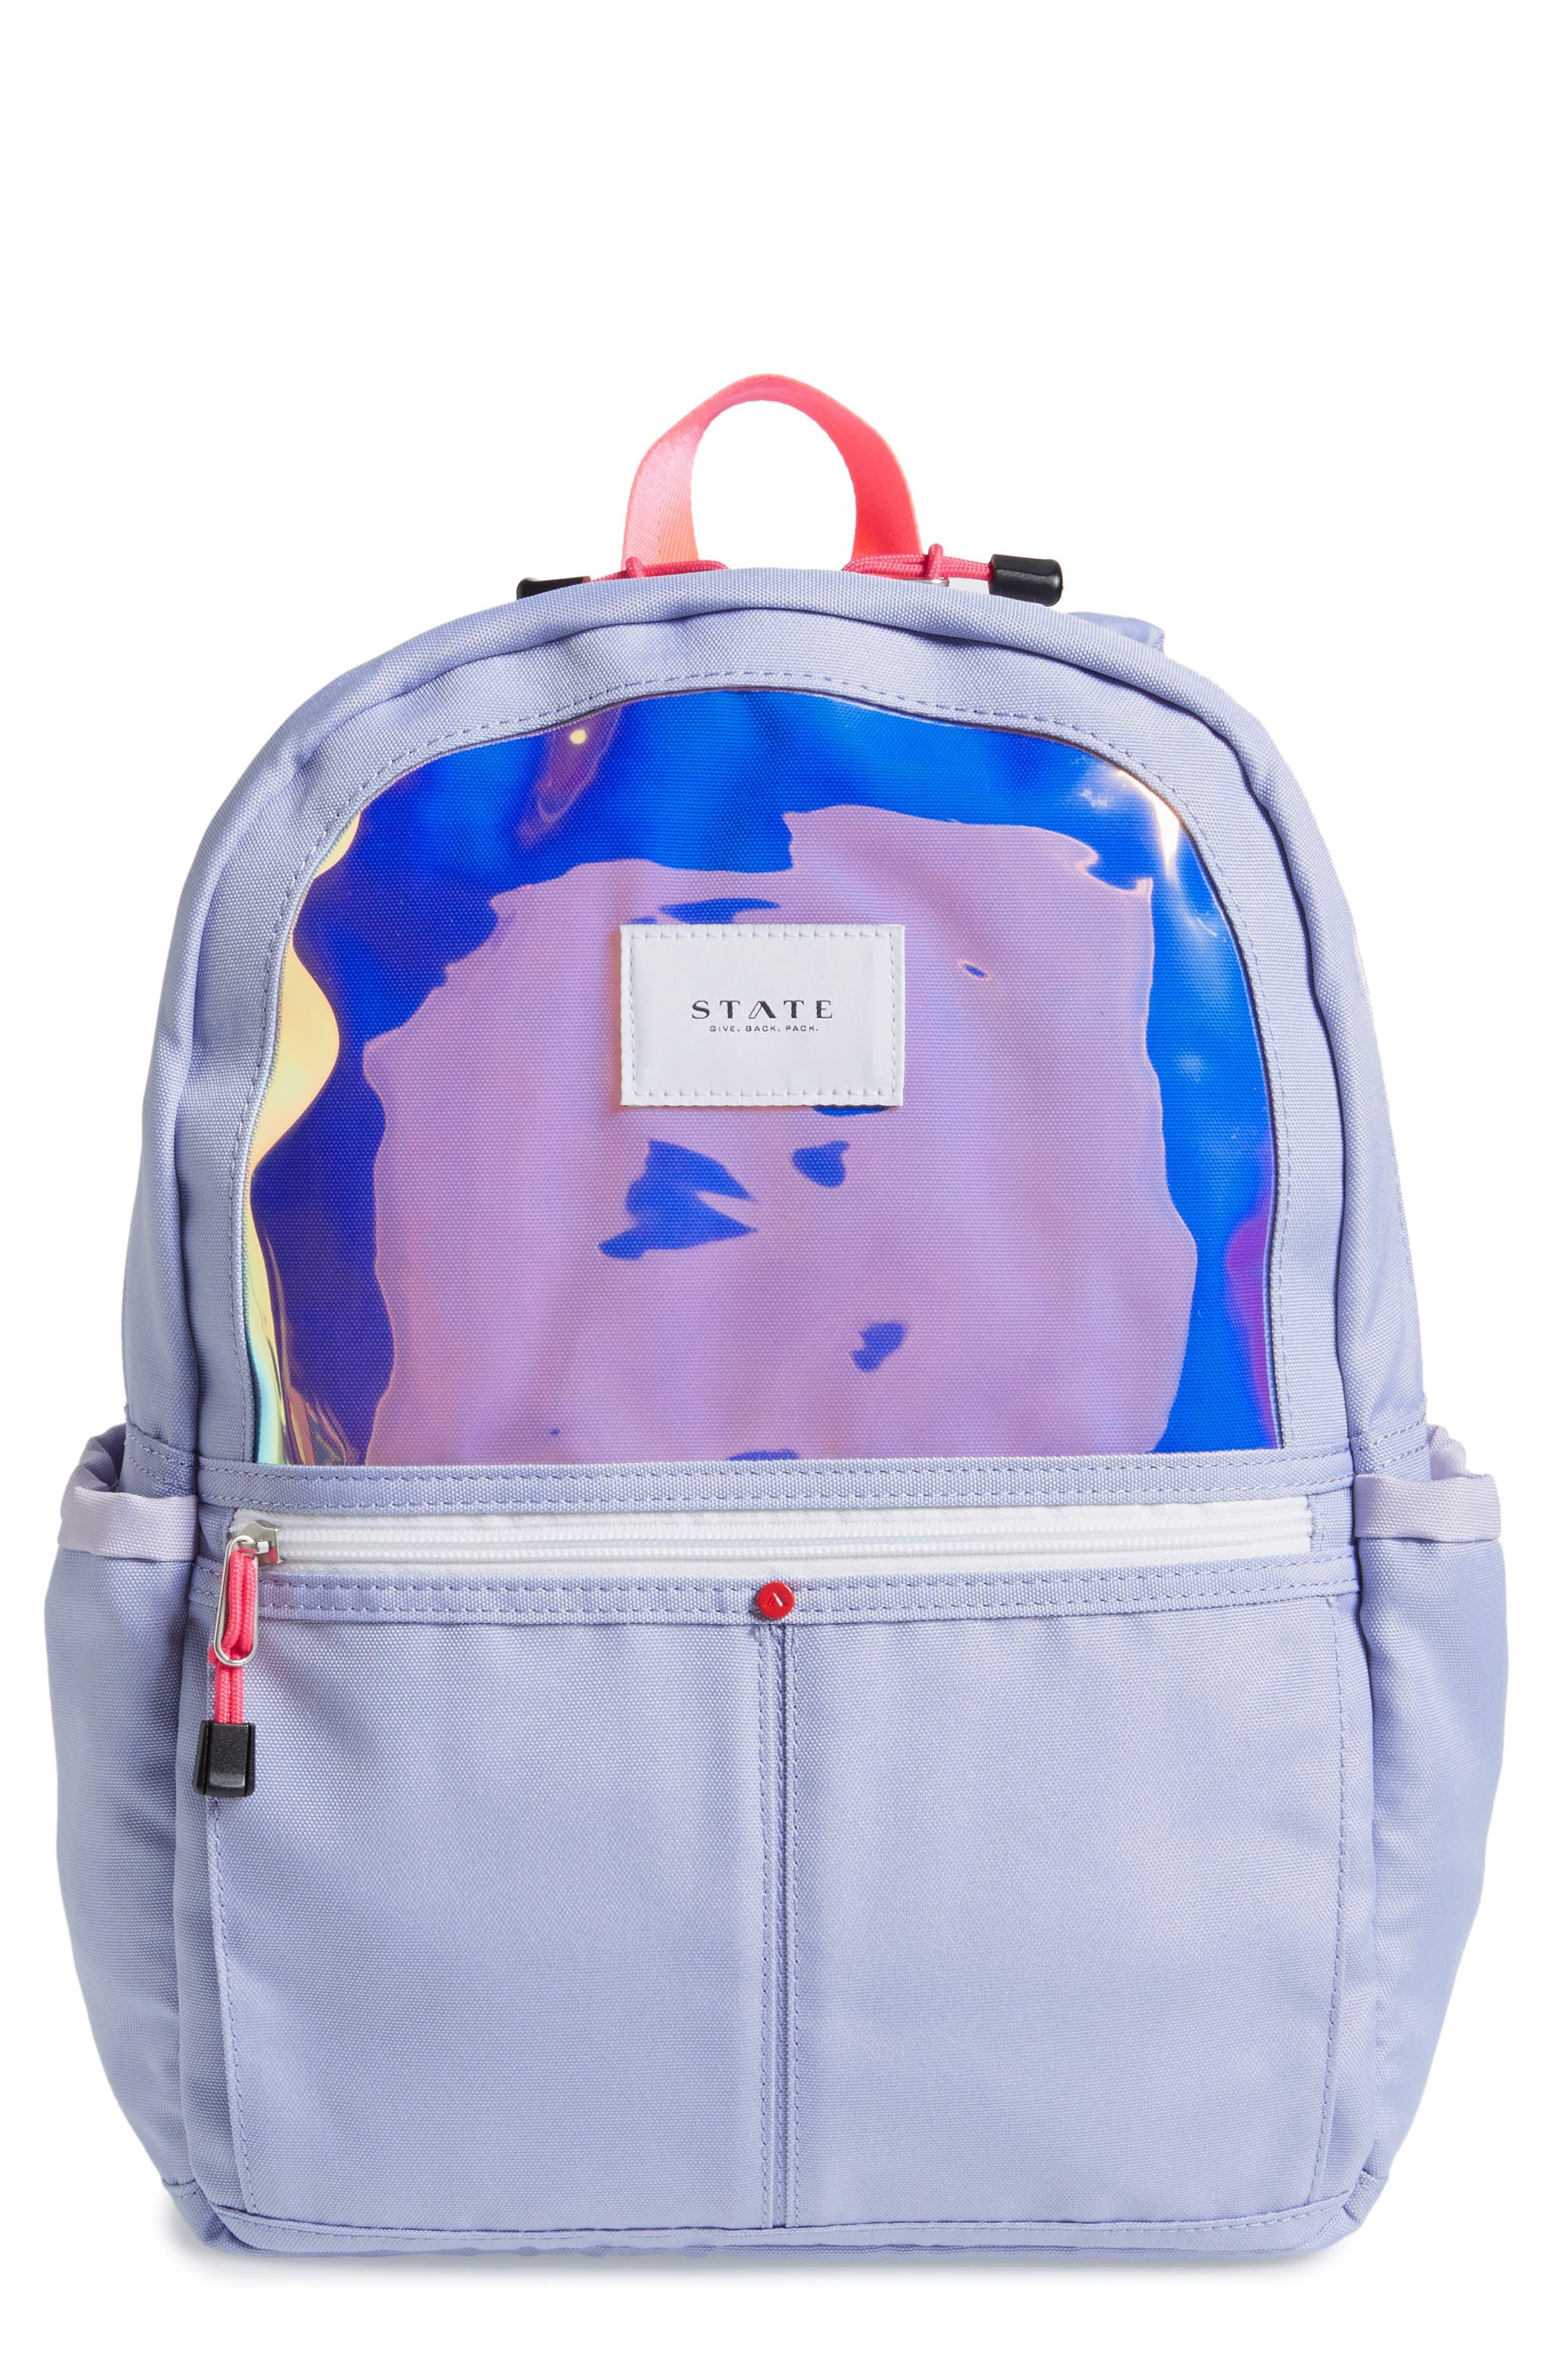 STATE Bags Coney Island Kane Backpack (Kids)